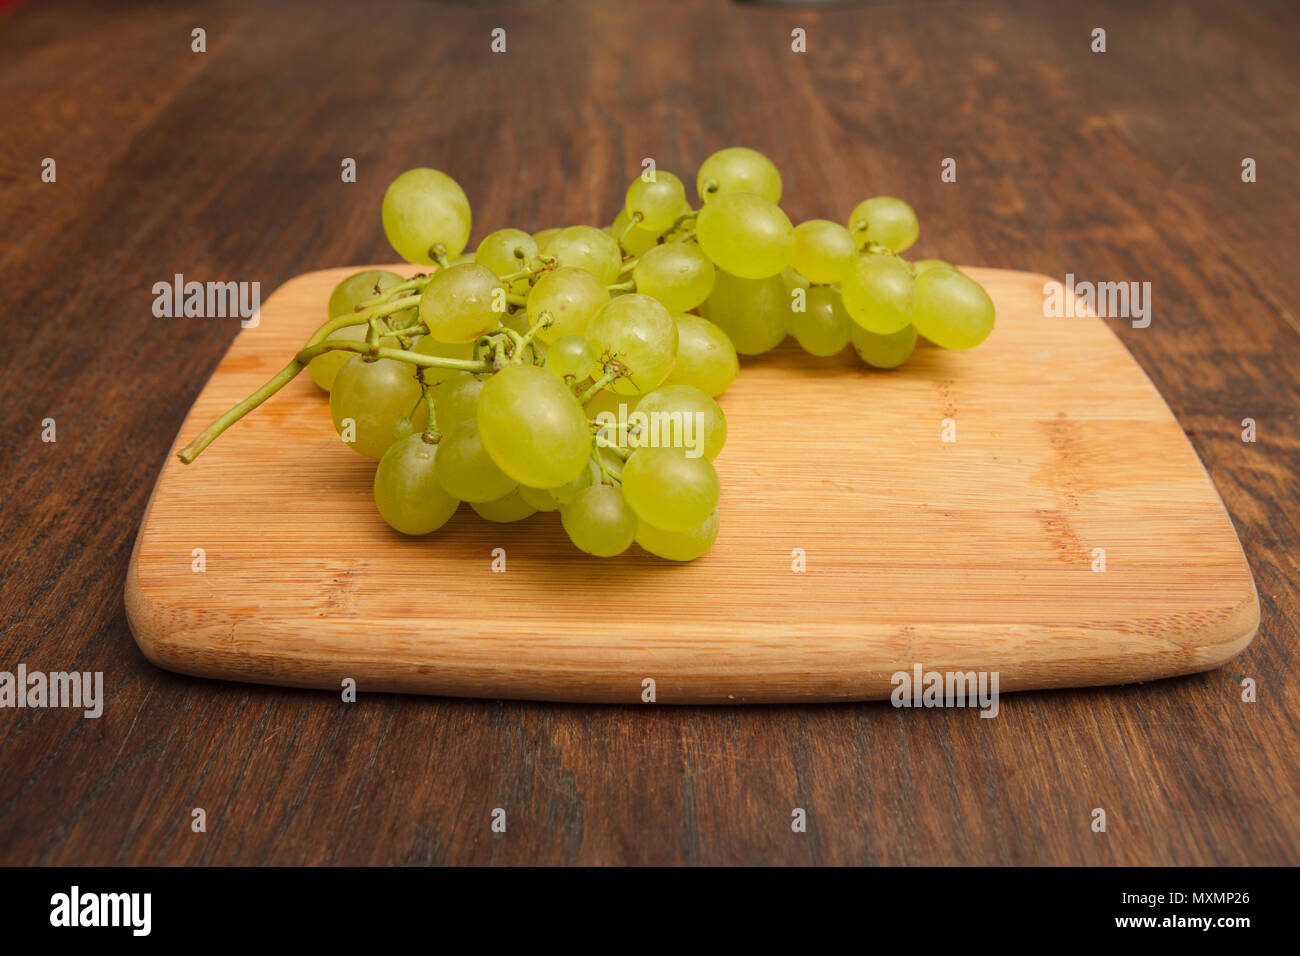 white fresh grapes on woden baord, on oak table - Stock Image